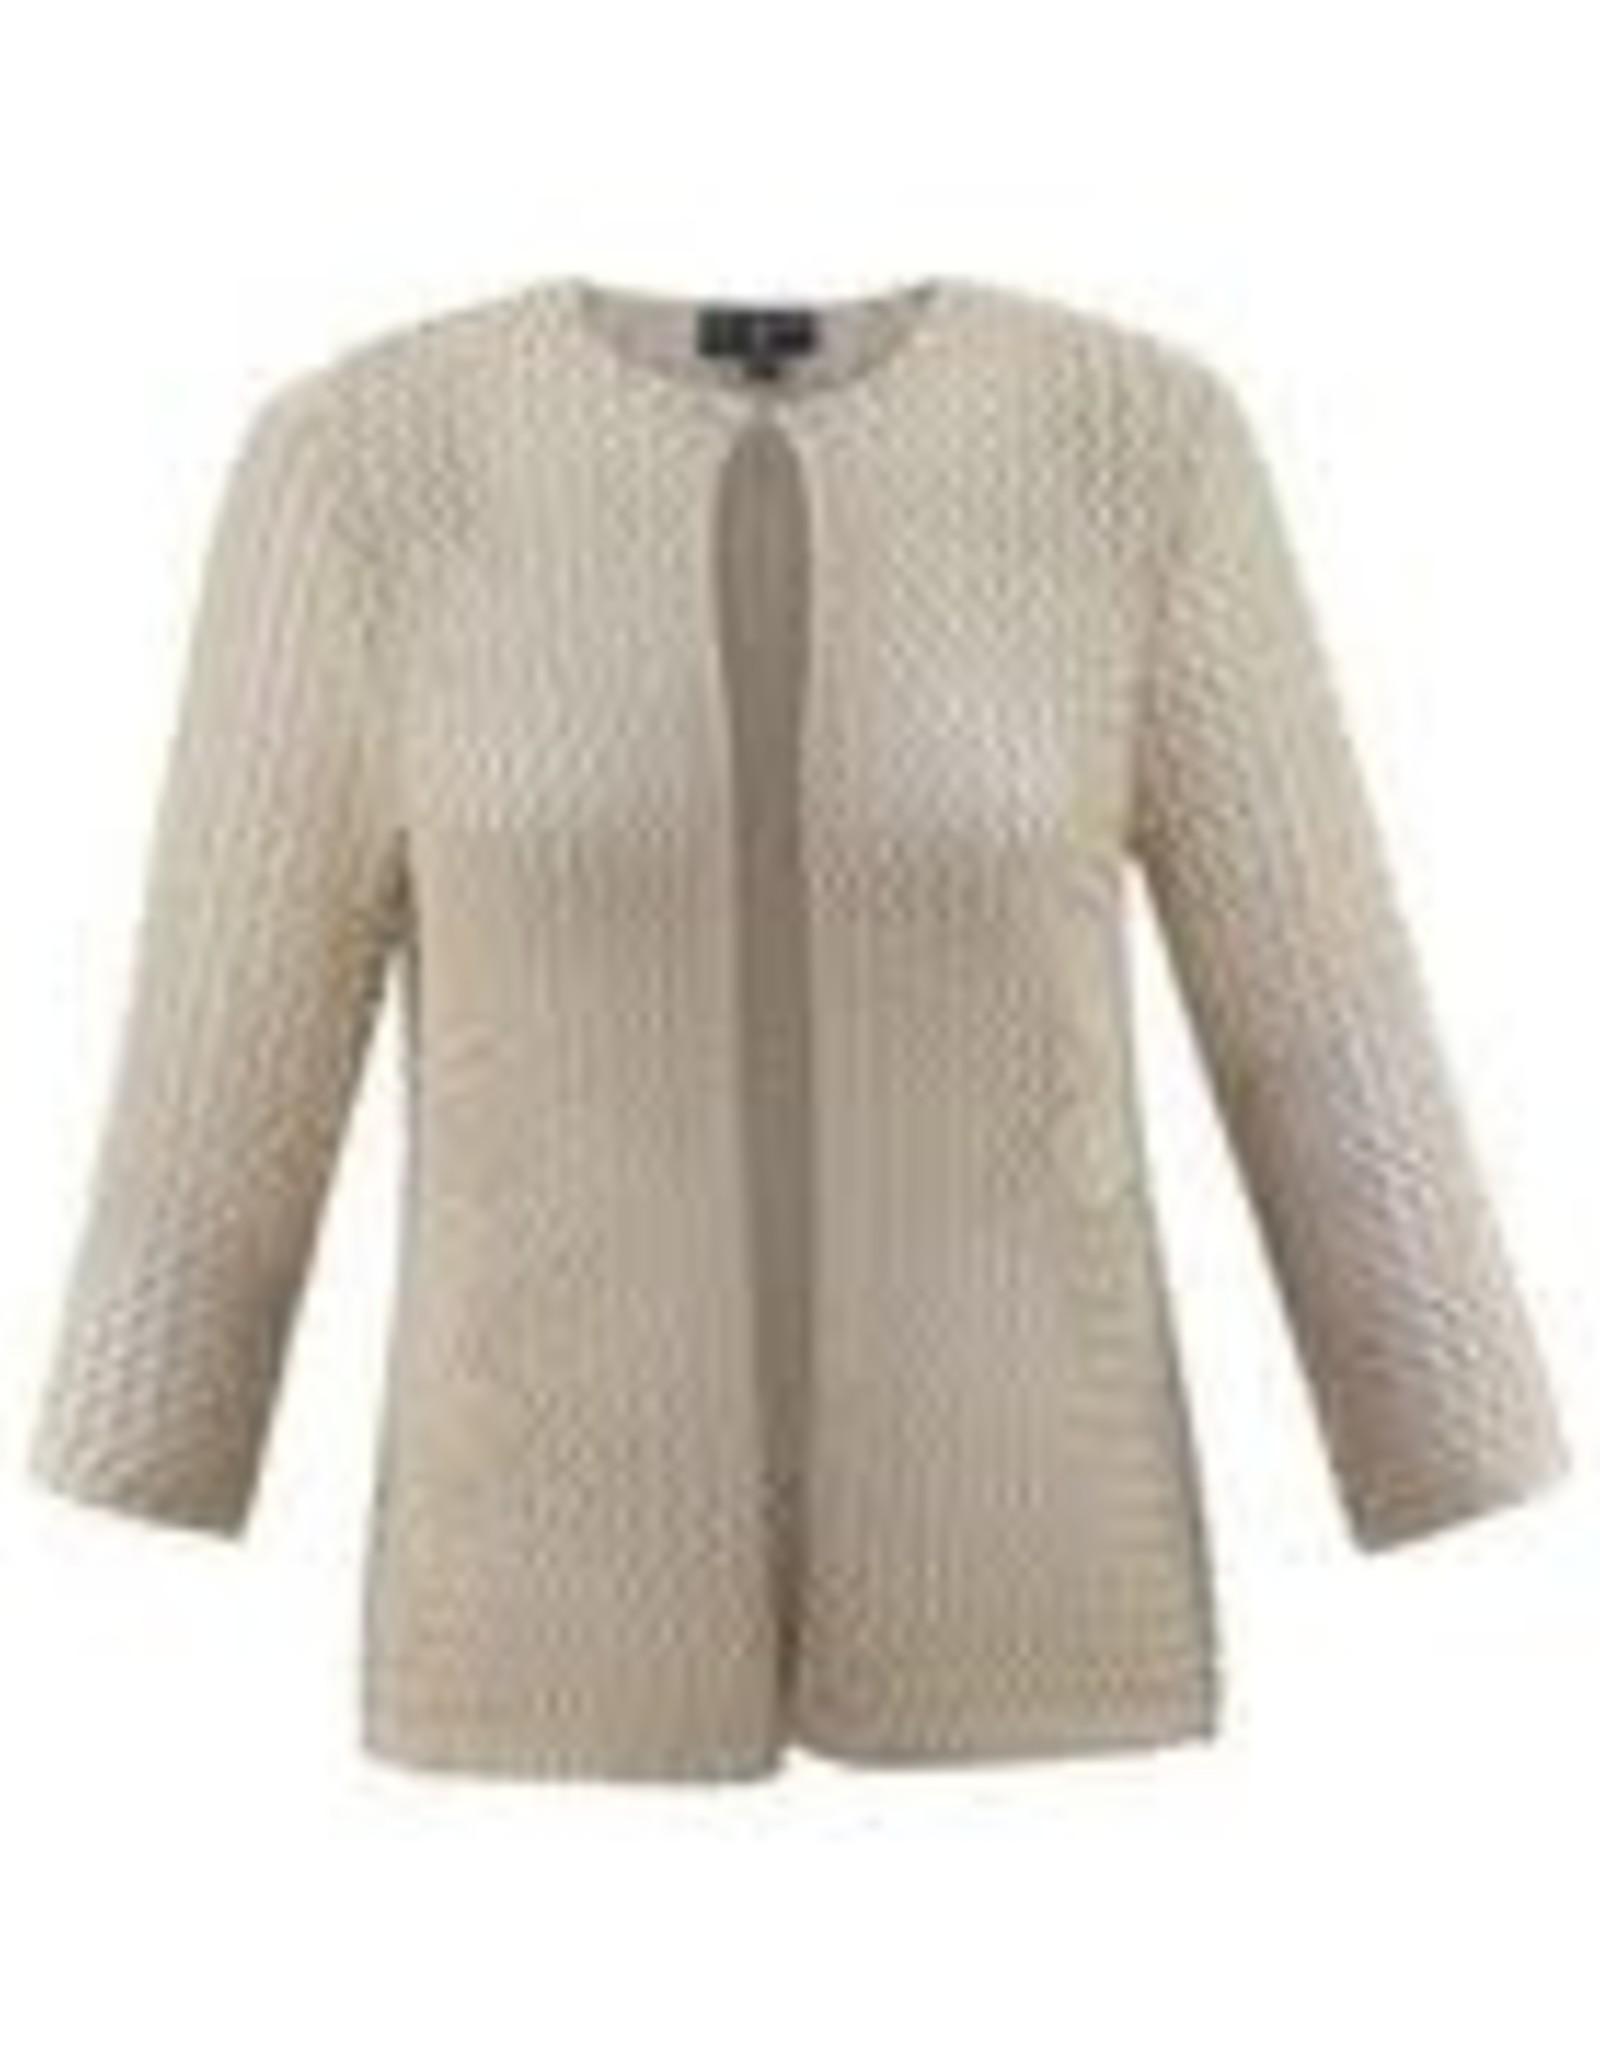 Marble MB-5624 Crochet Cardigan